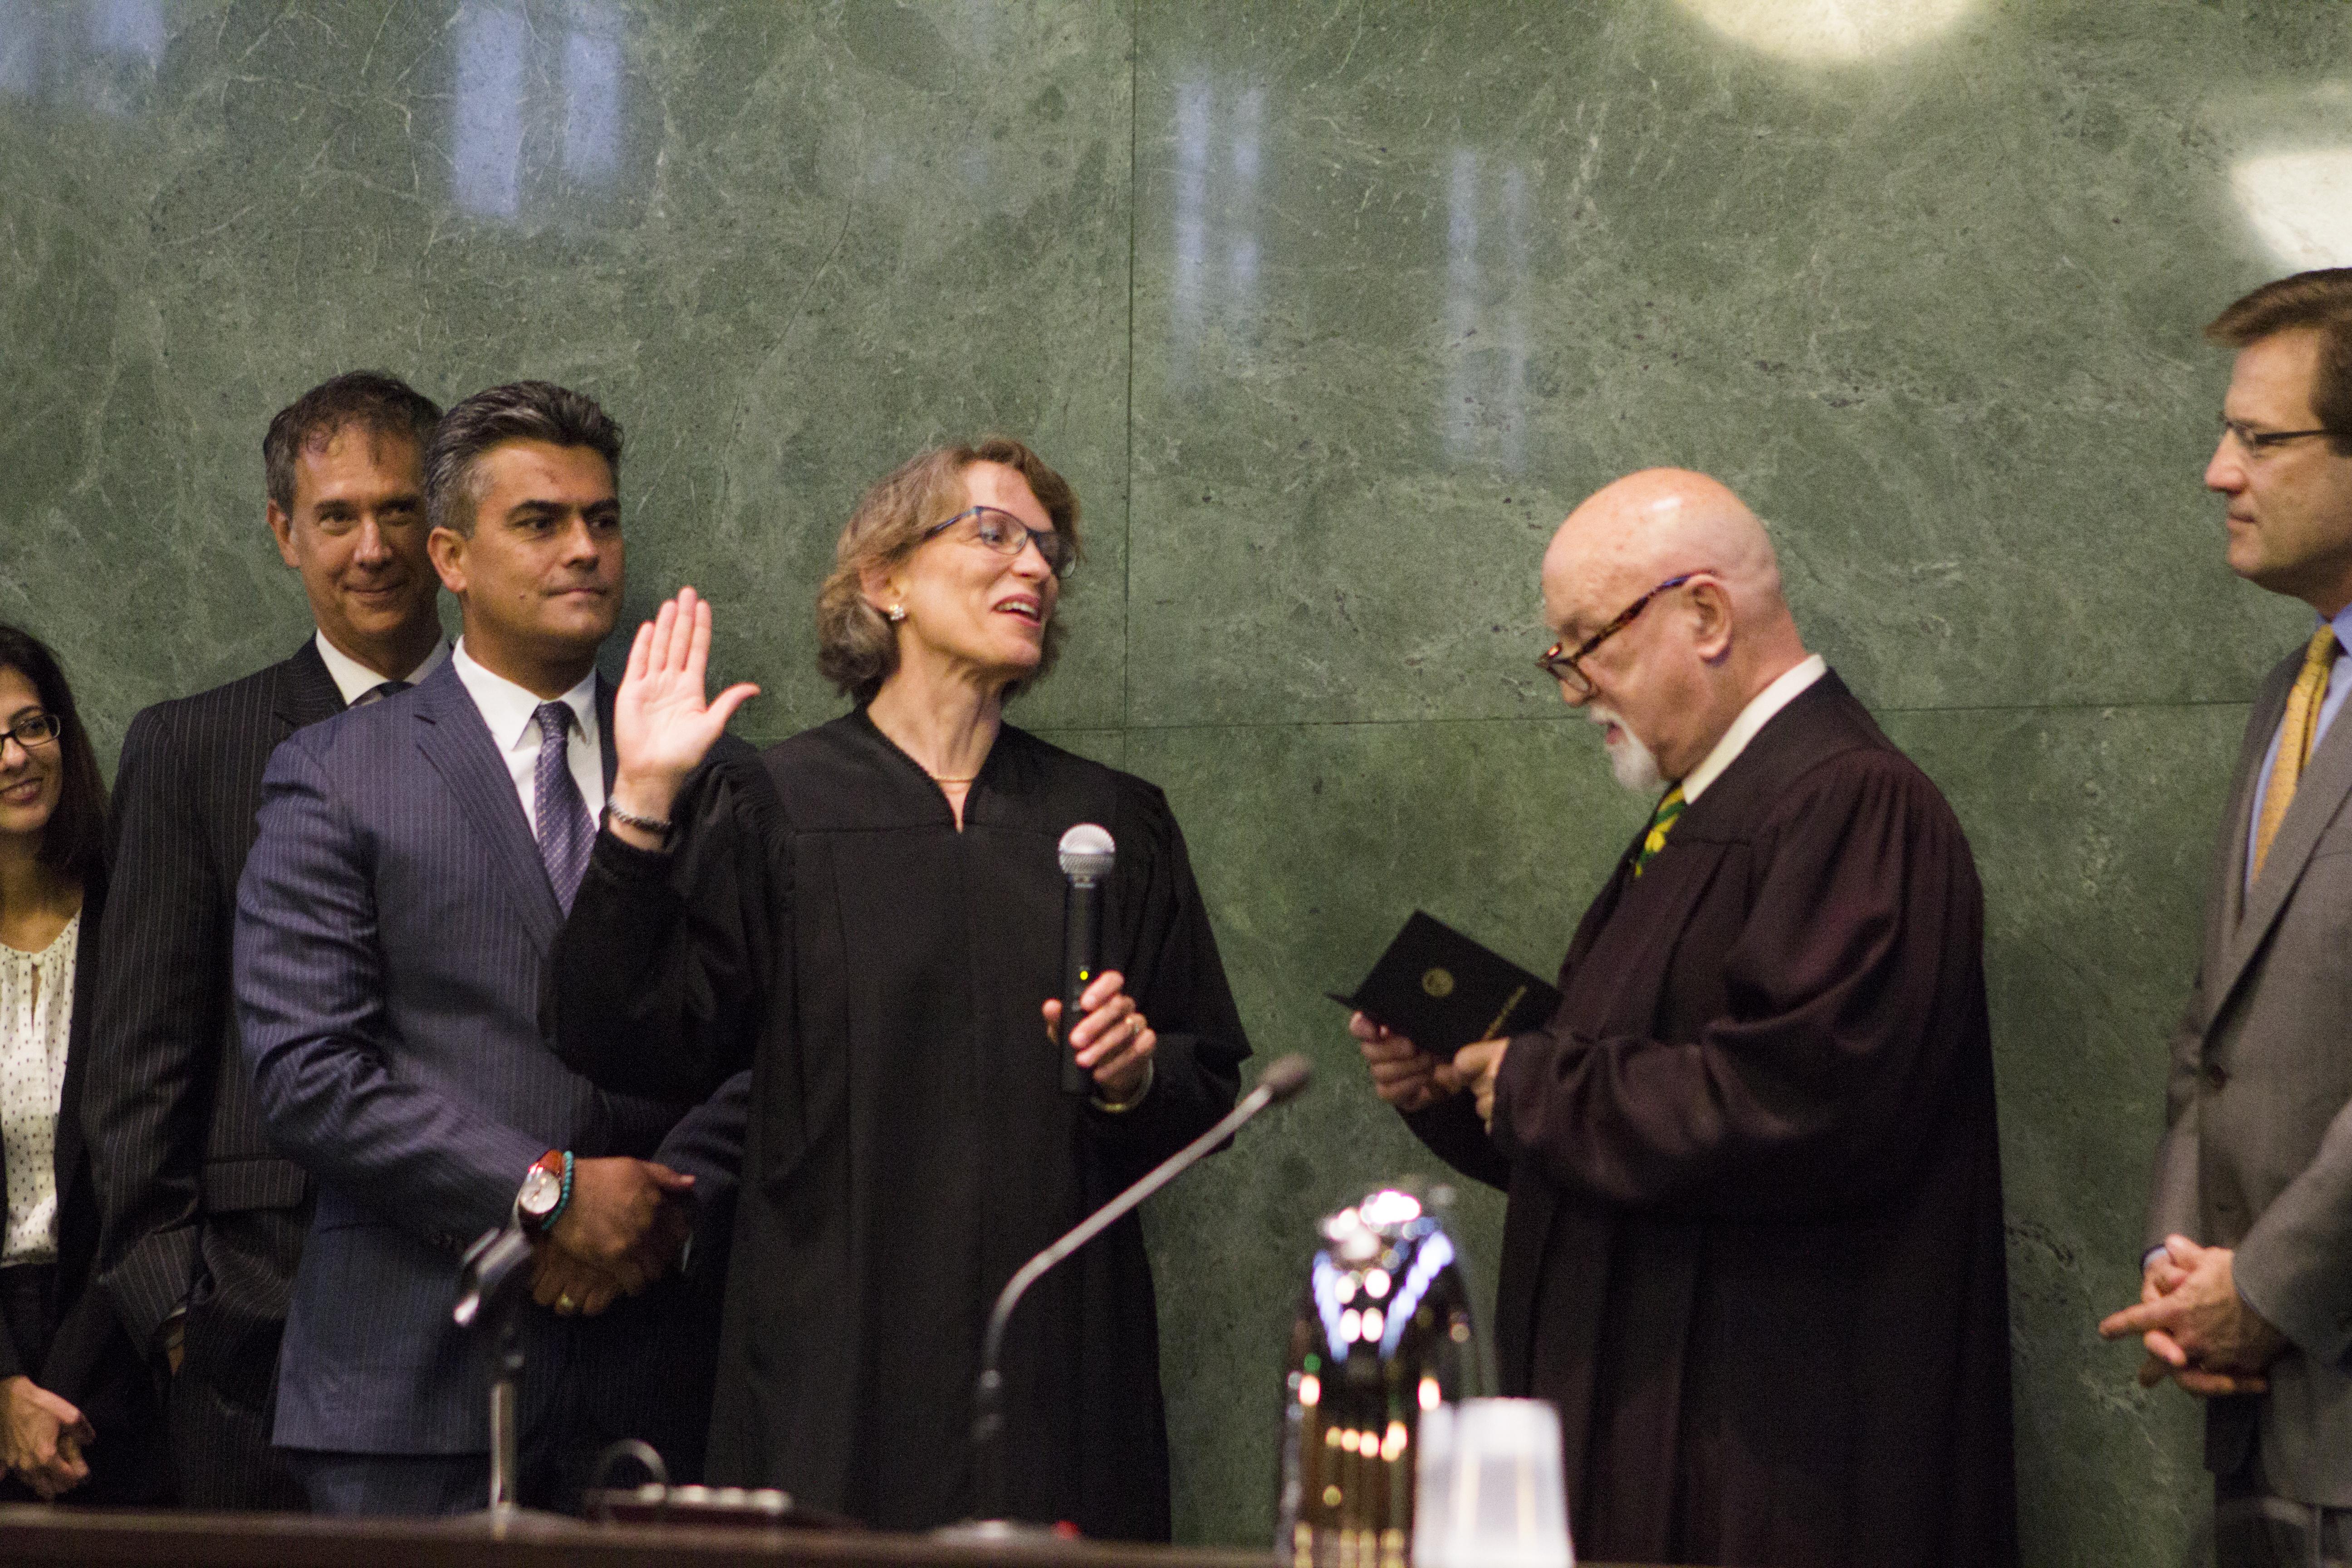 Justice Alison M. Tucher